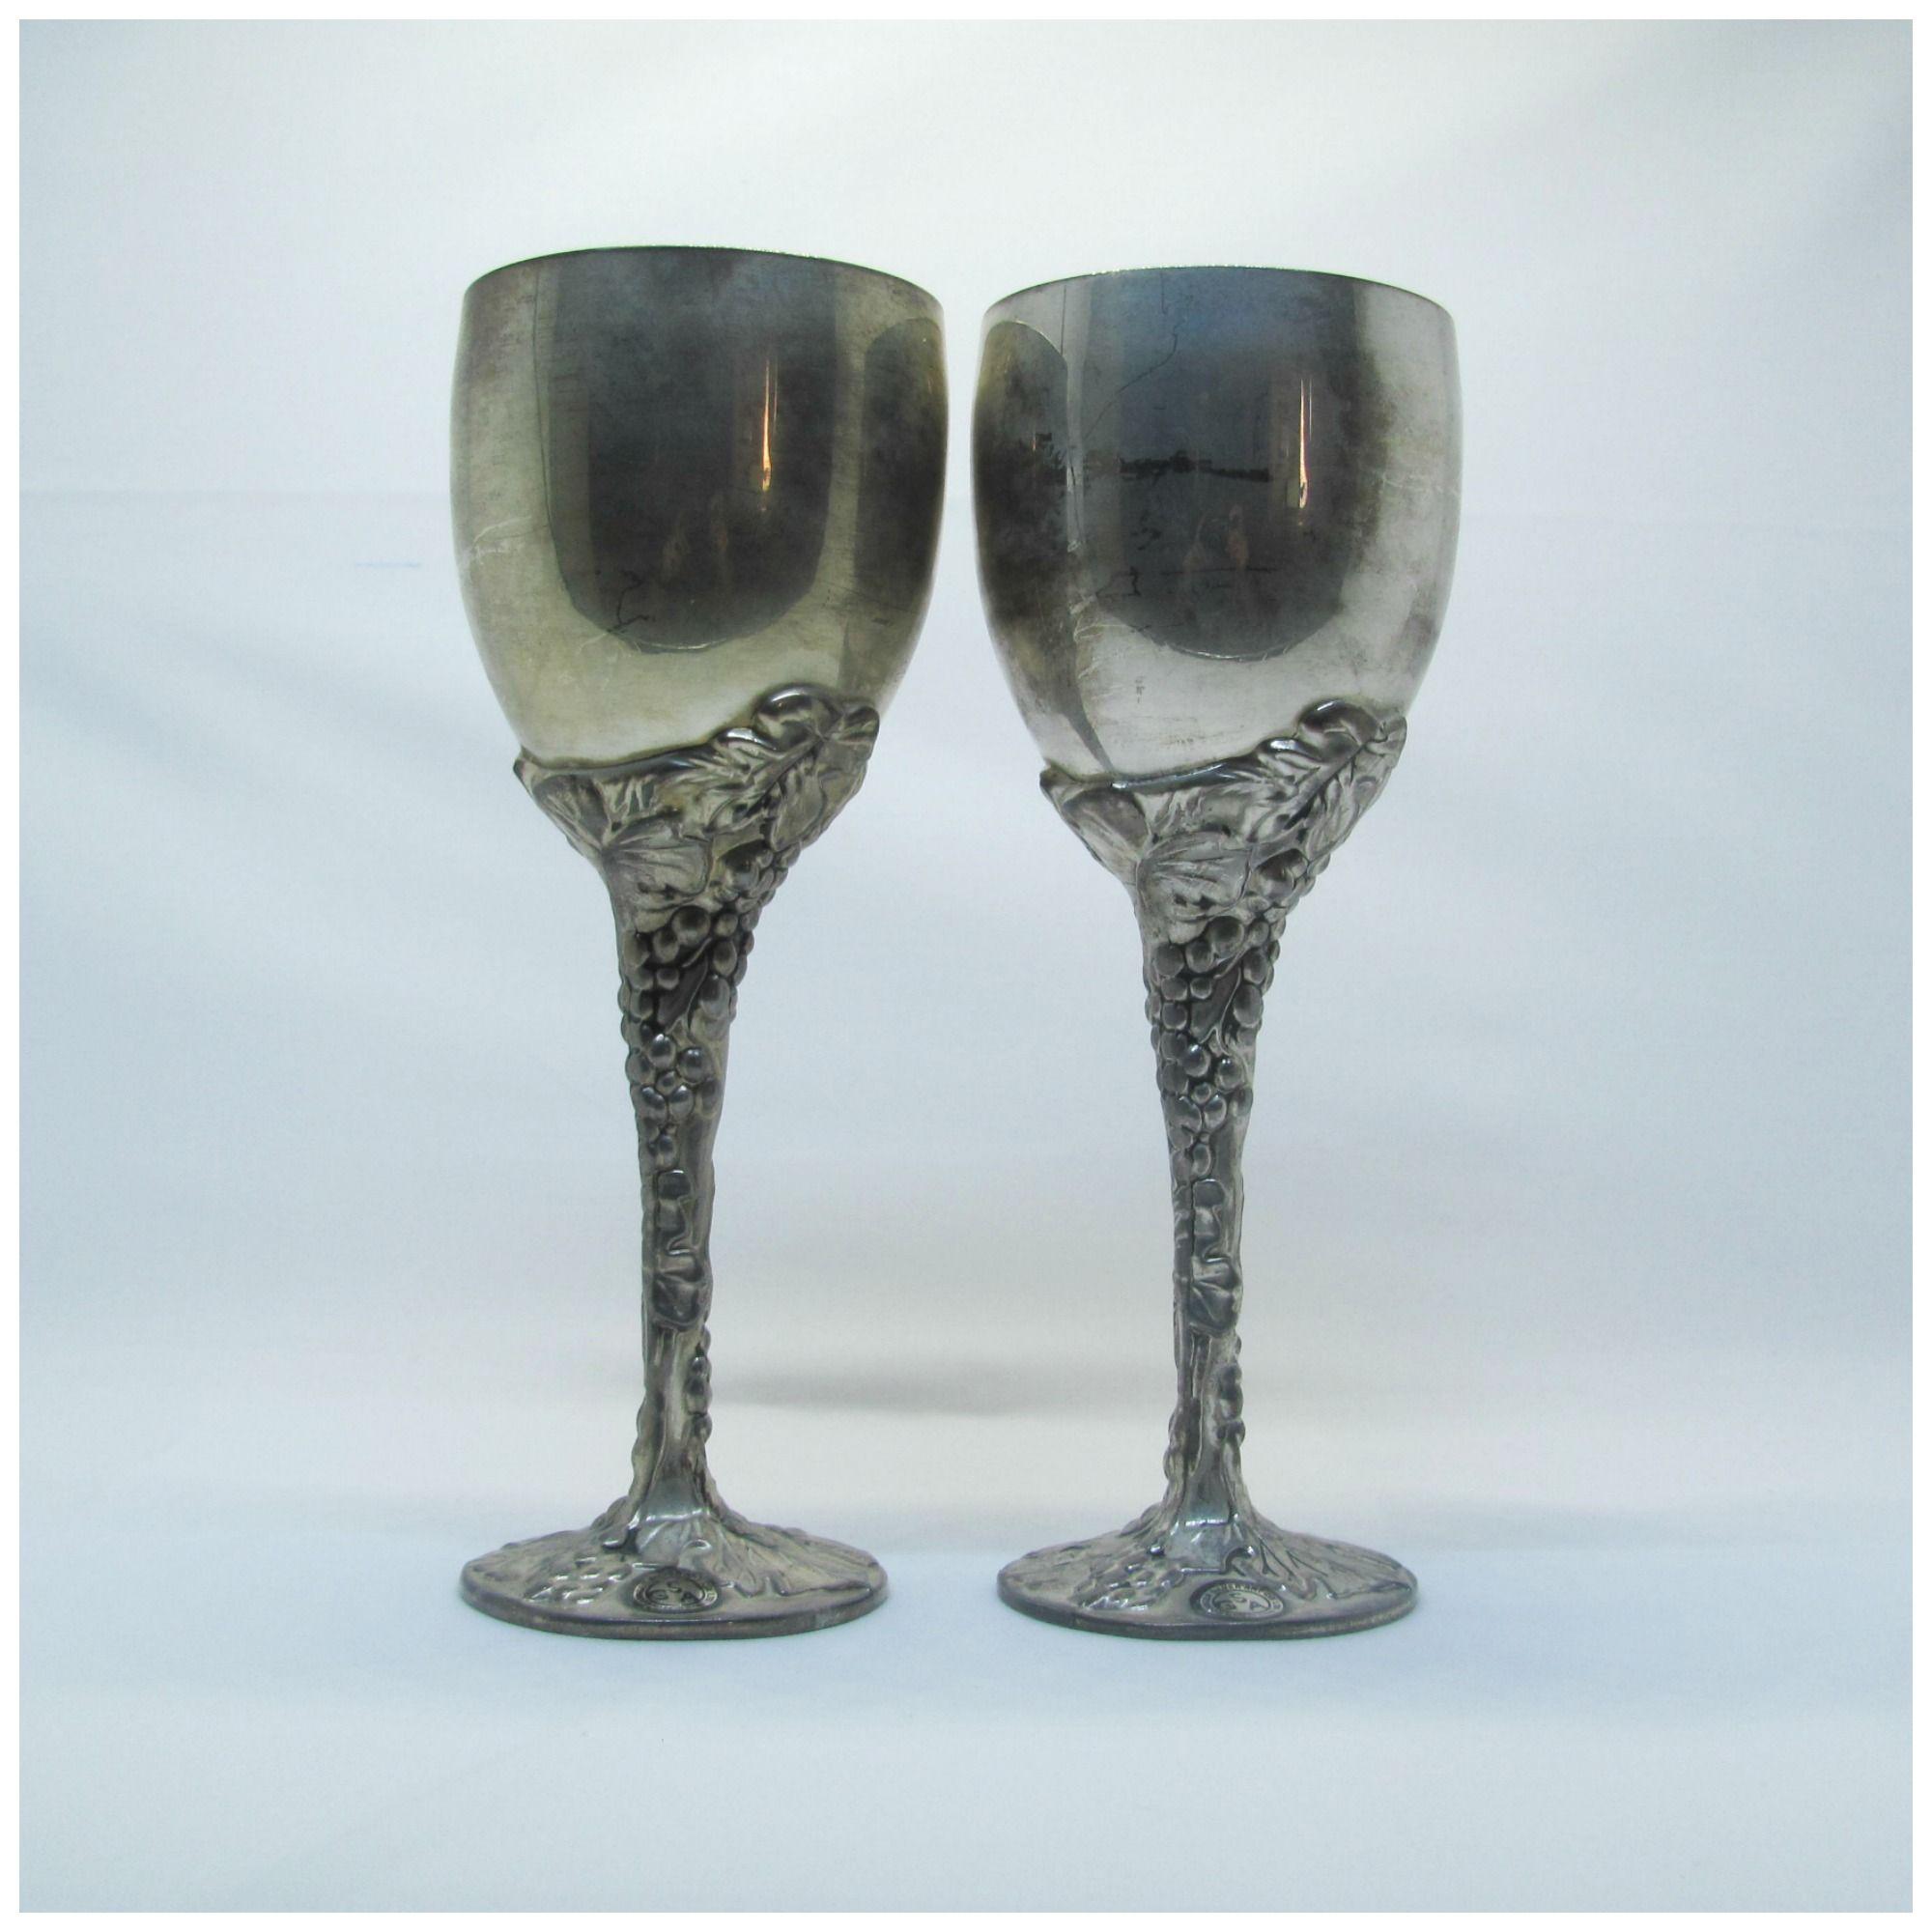 delightful Godinger Silver Art Co. Ltd Part - 14: Vintage Godinger Silver Art Co.LTD Silver Plated Wine Goblets